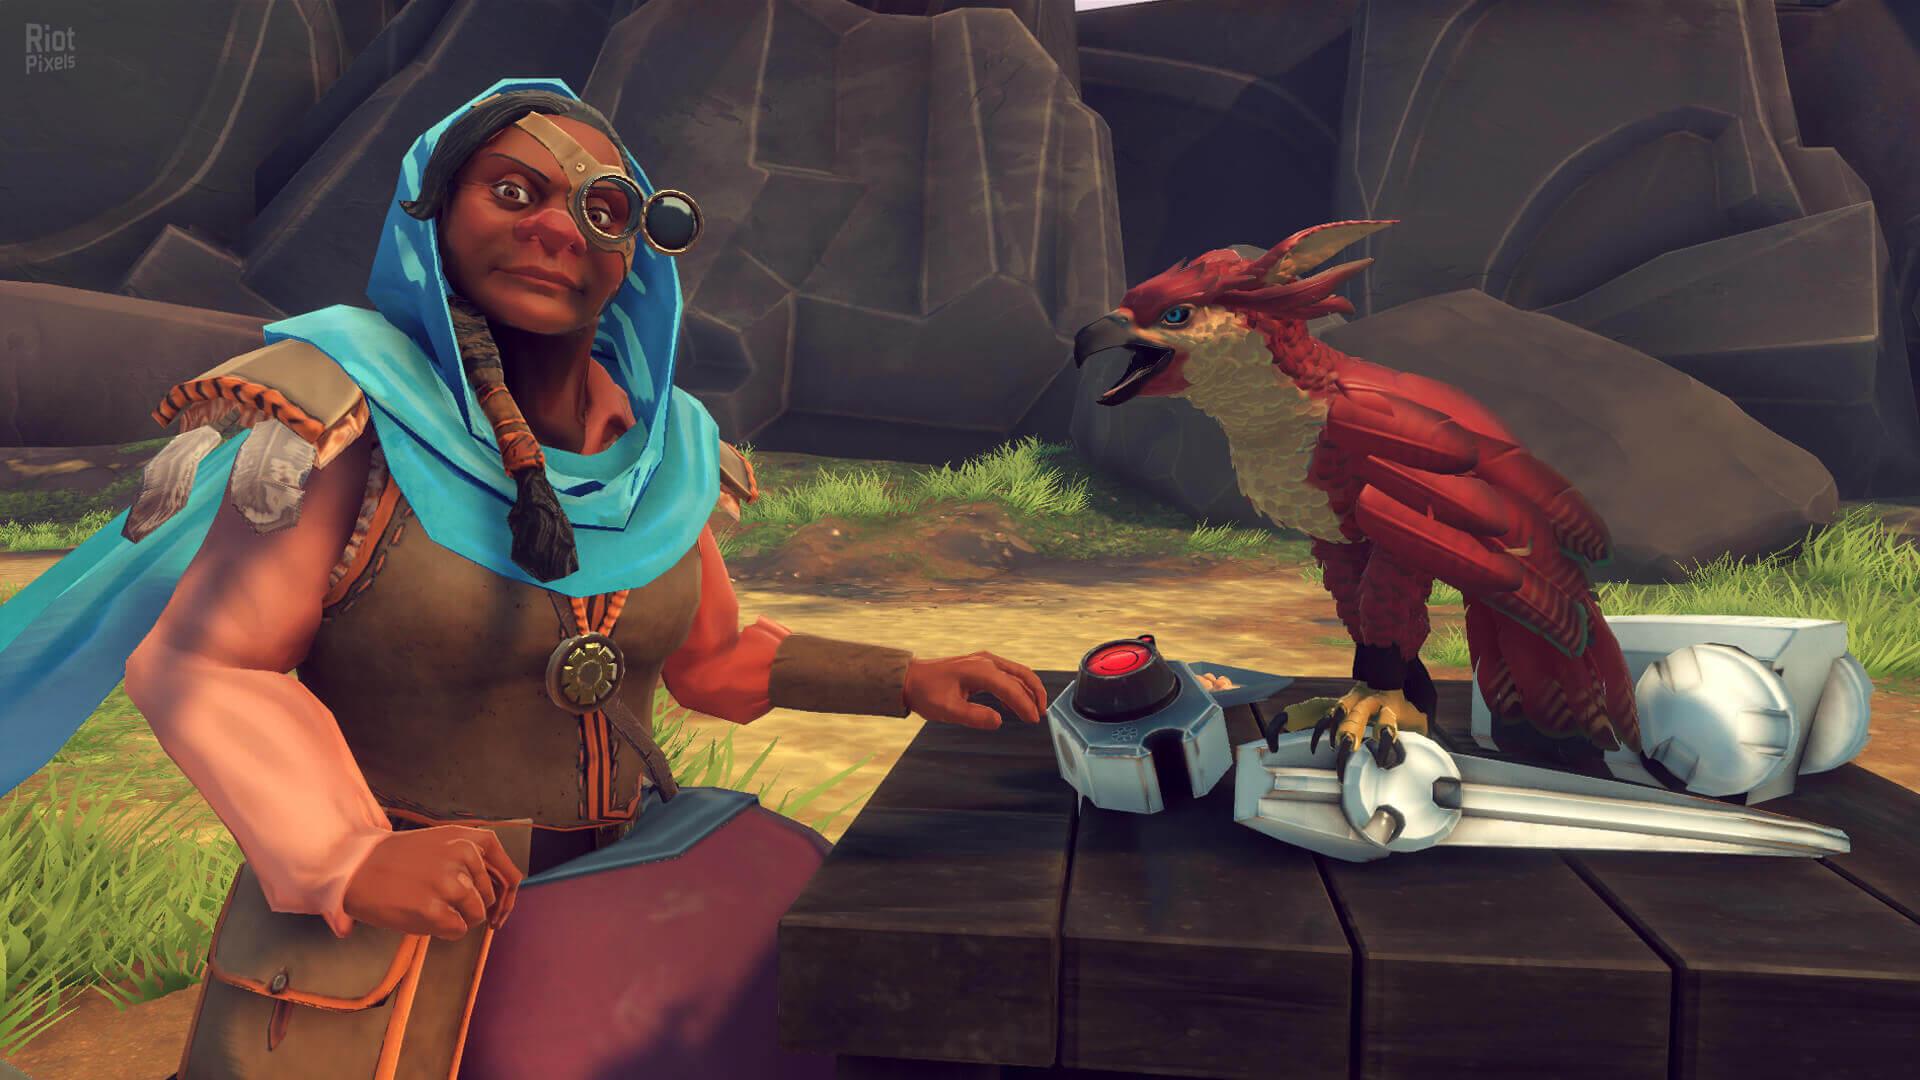 Falcon Age - game screenshots at Riot Pixels, images